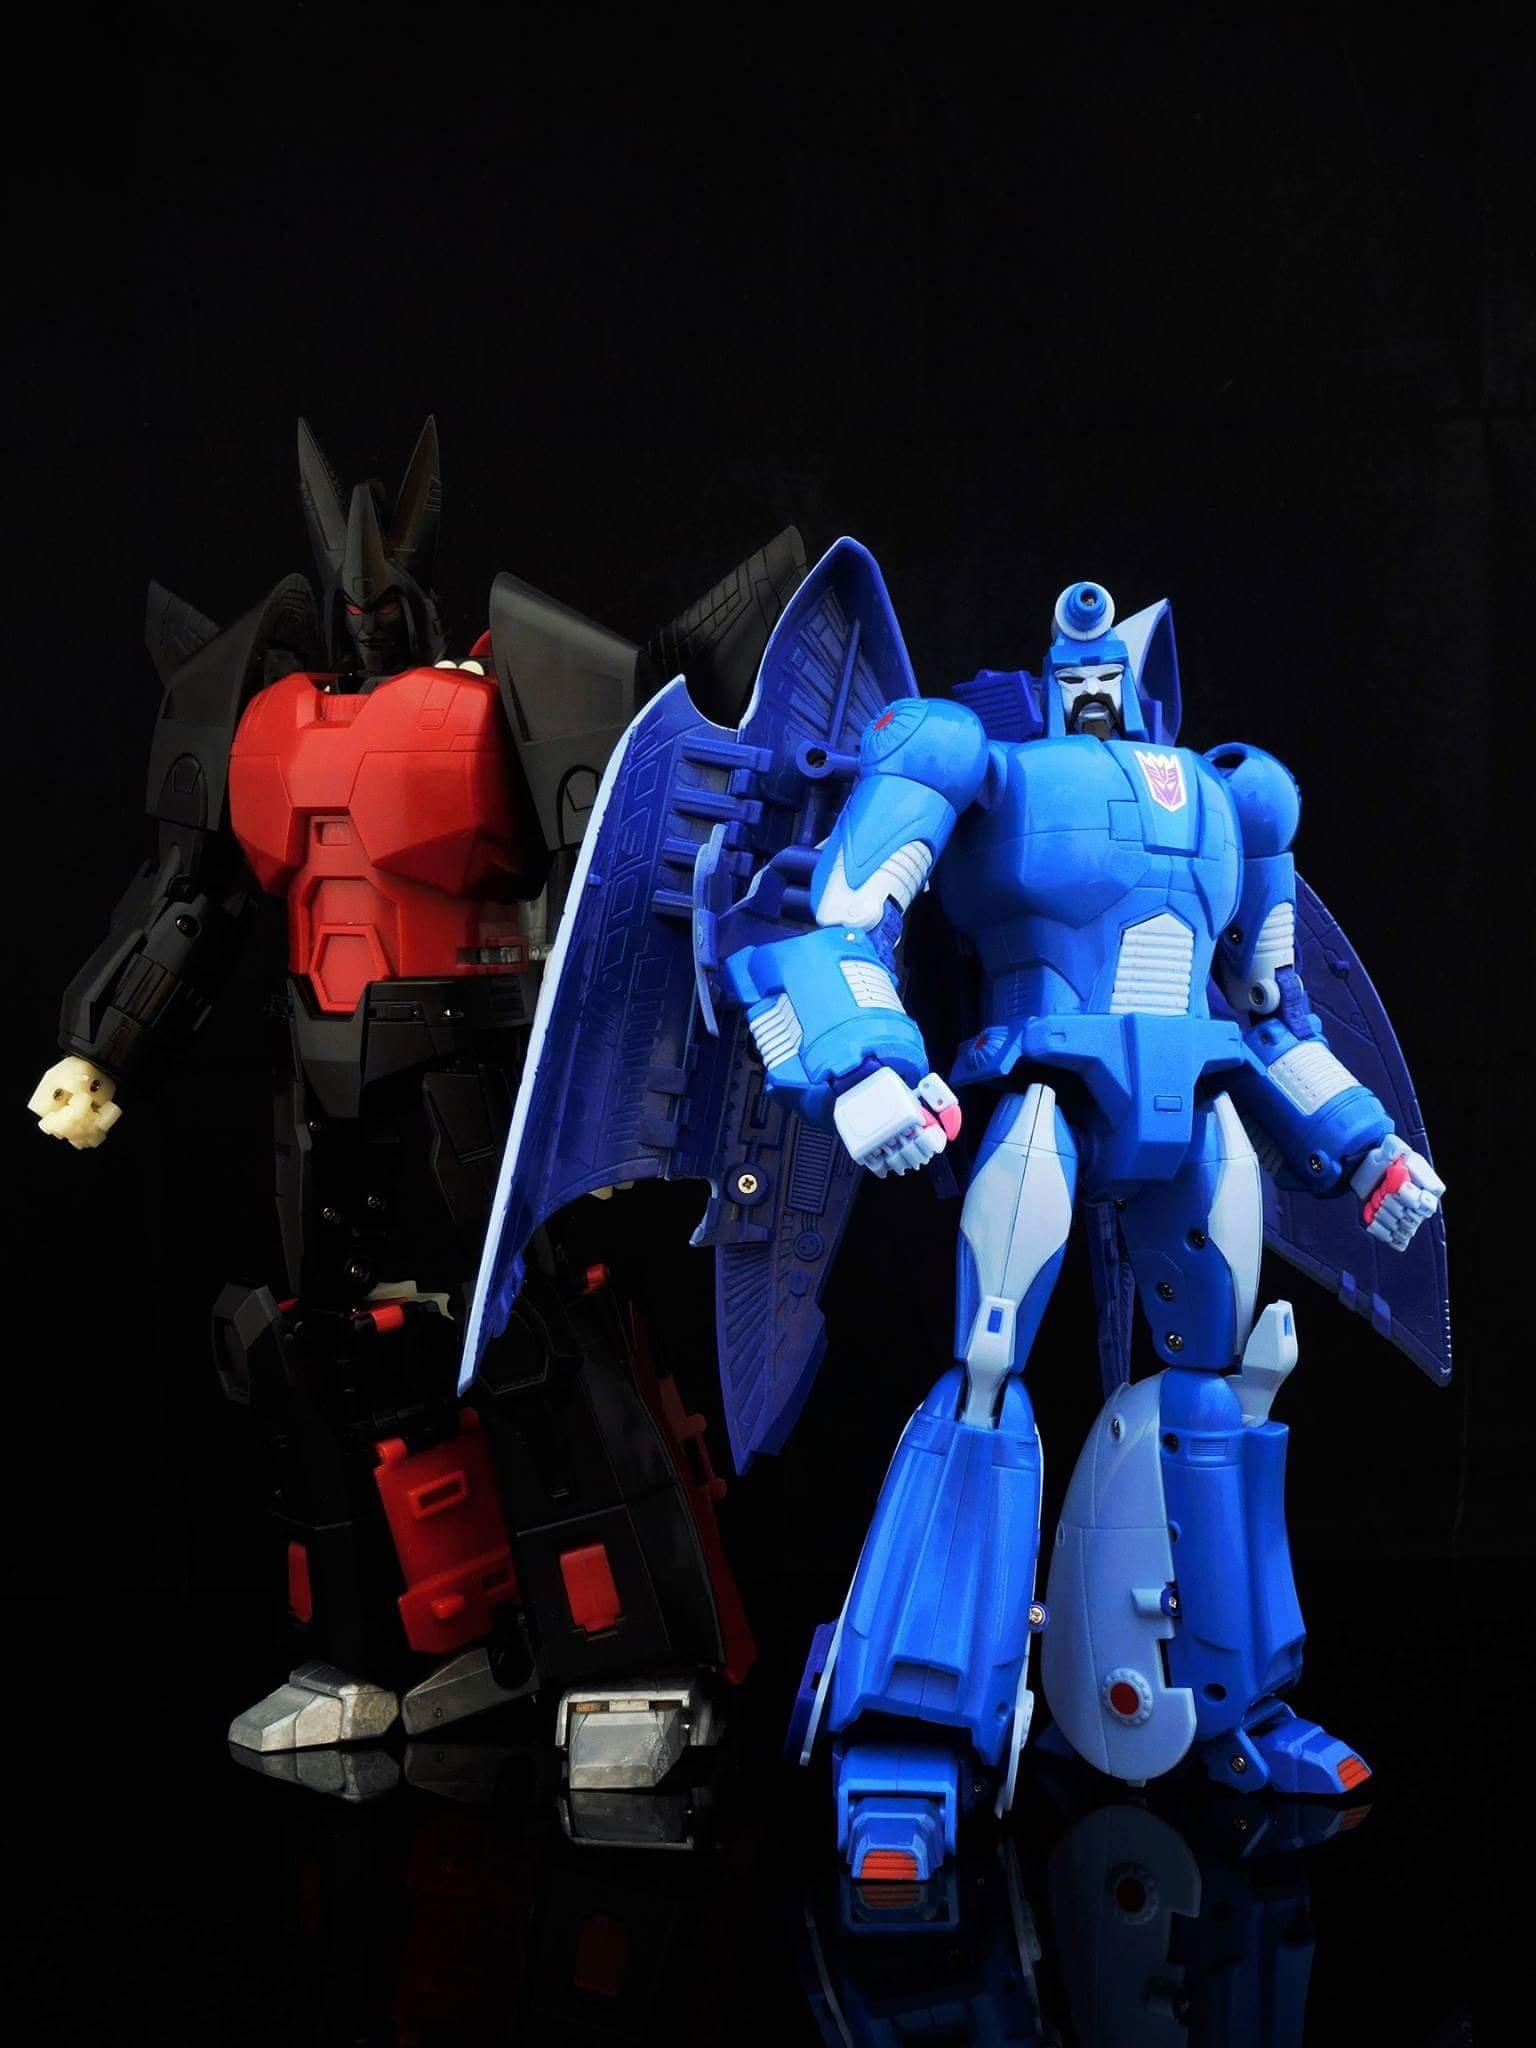 [X-Transbots] Produit Tiers - MX-III Eligos - aka Cyclonus - Page 2 HIQvkyyo